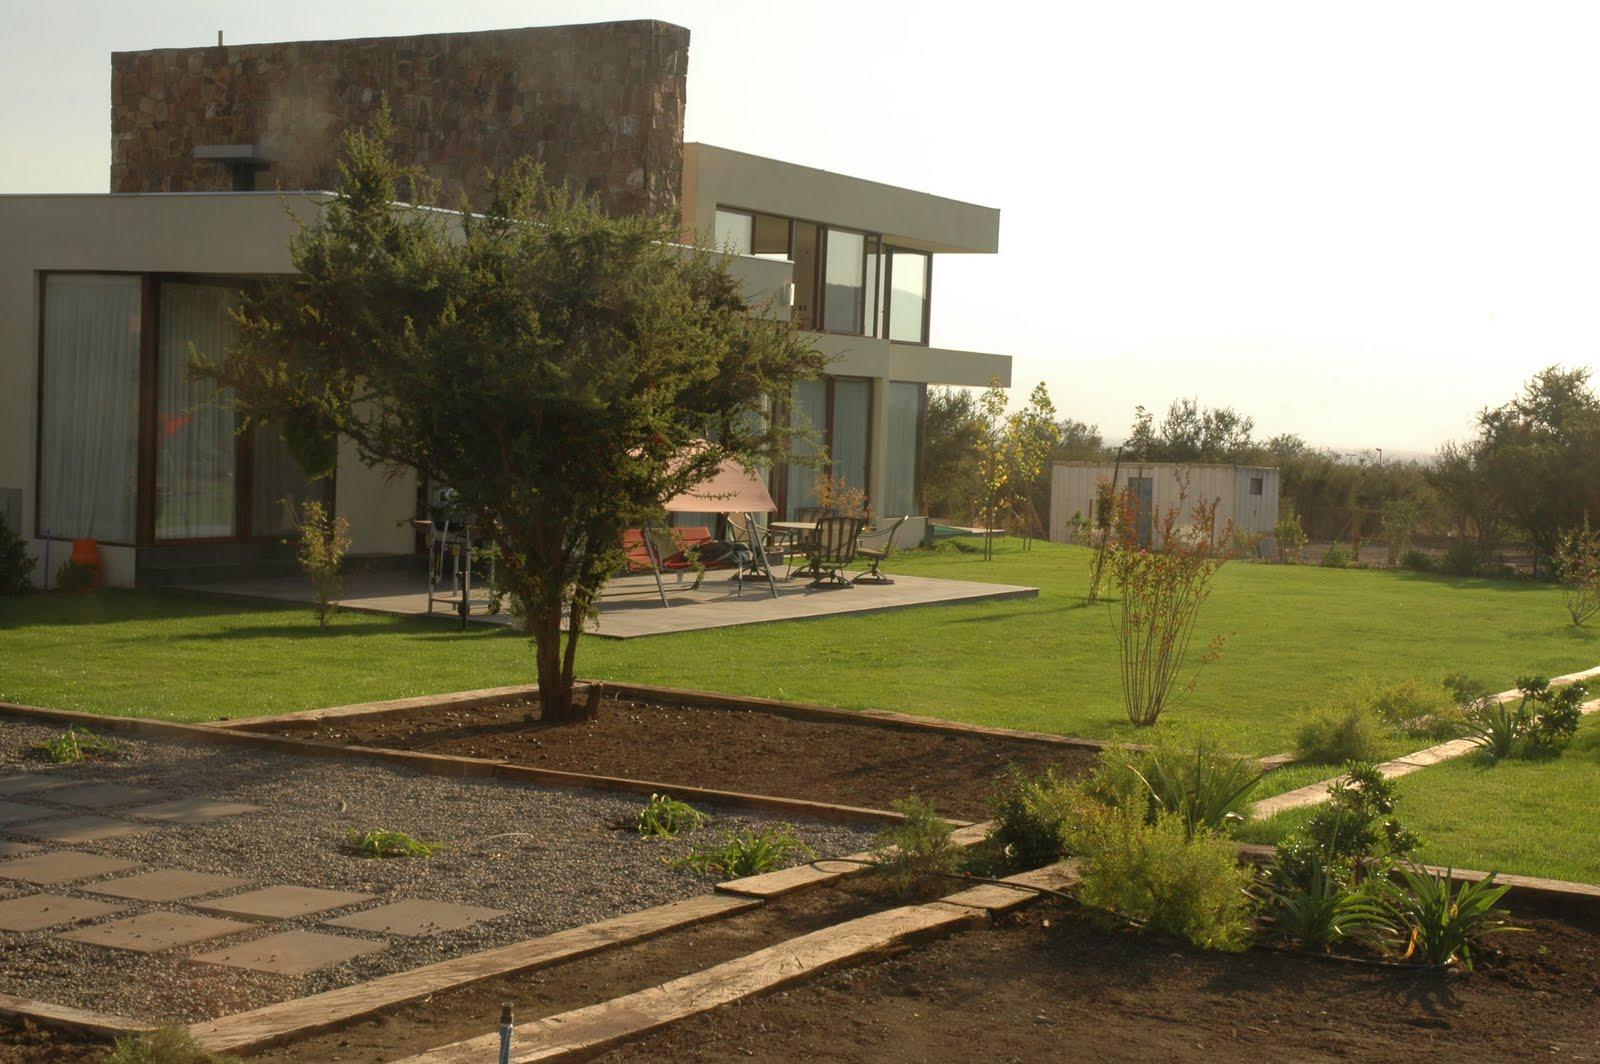 Jardin familia devandas francisco silva claudio pezzani for Arquitectura de jardines